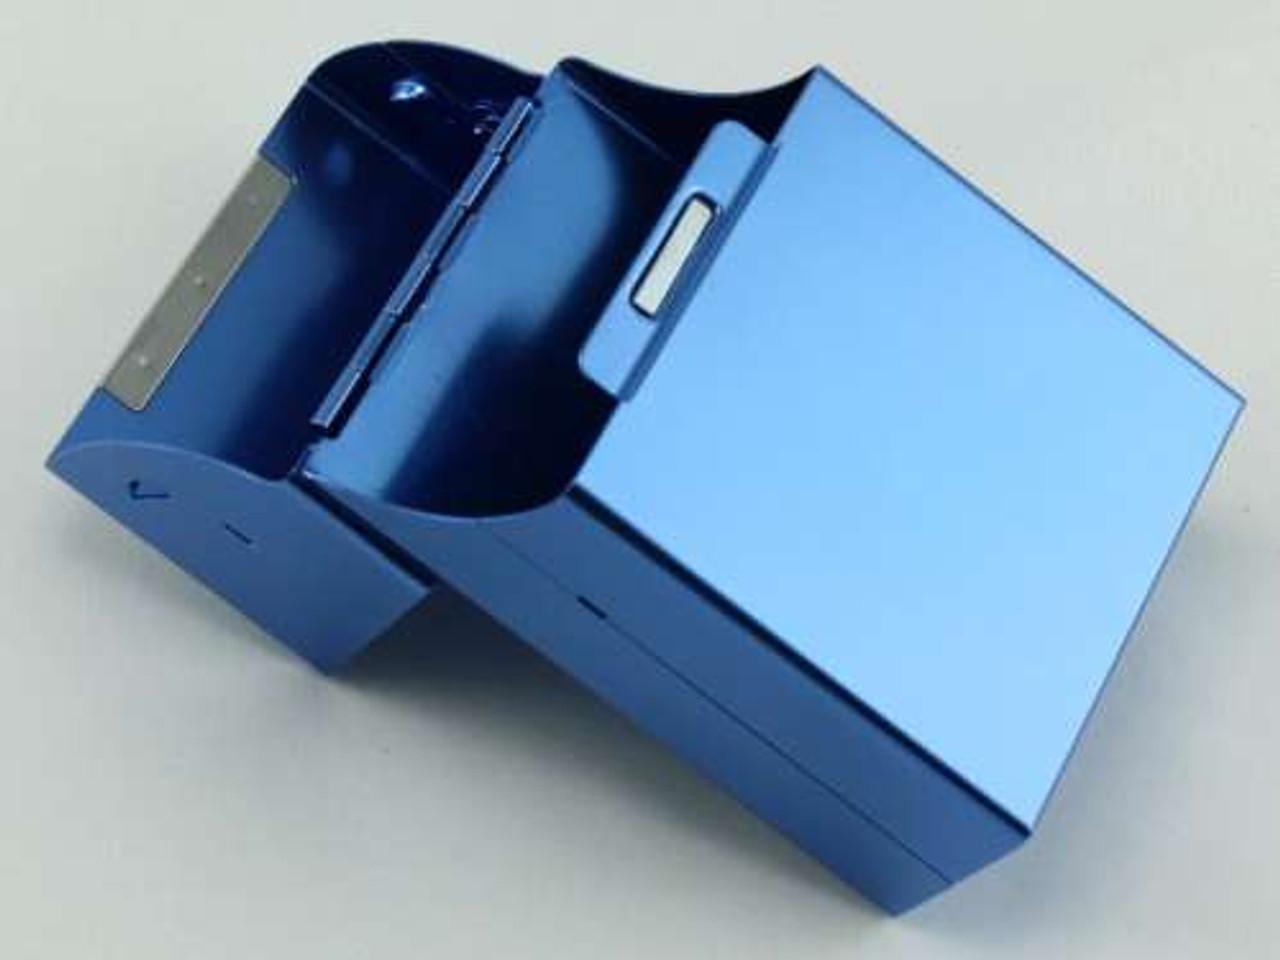 Blue Sky Cigarette Pack Holder